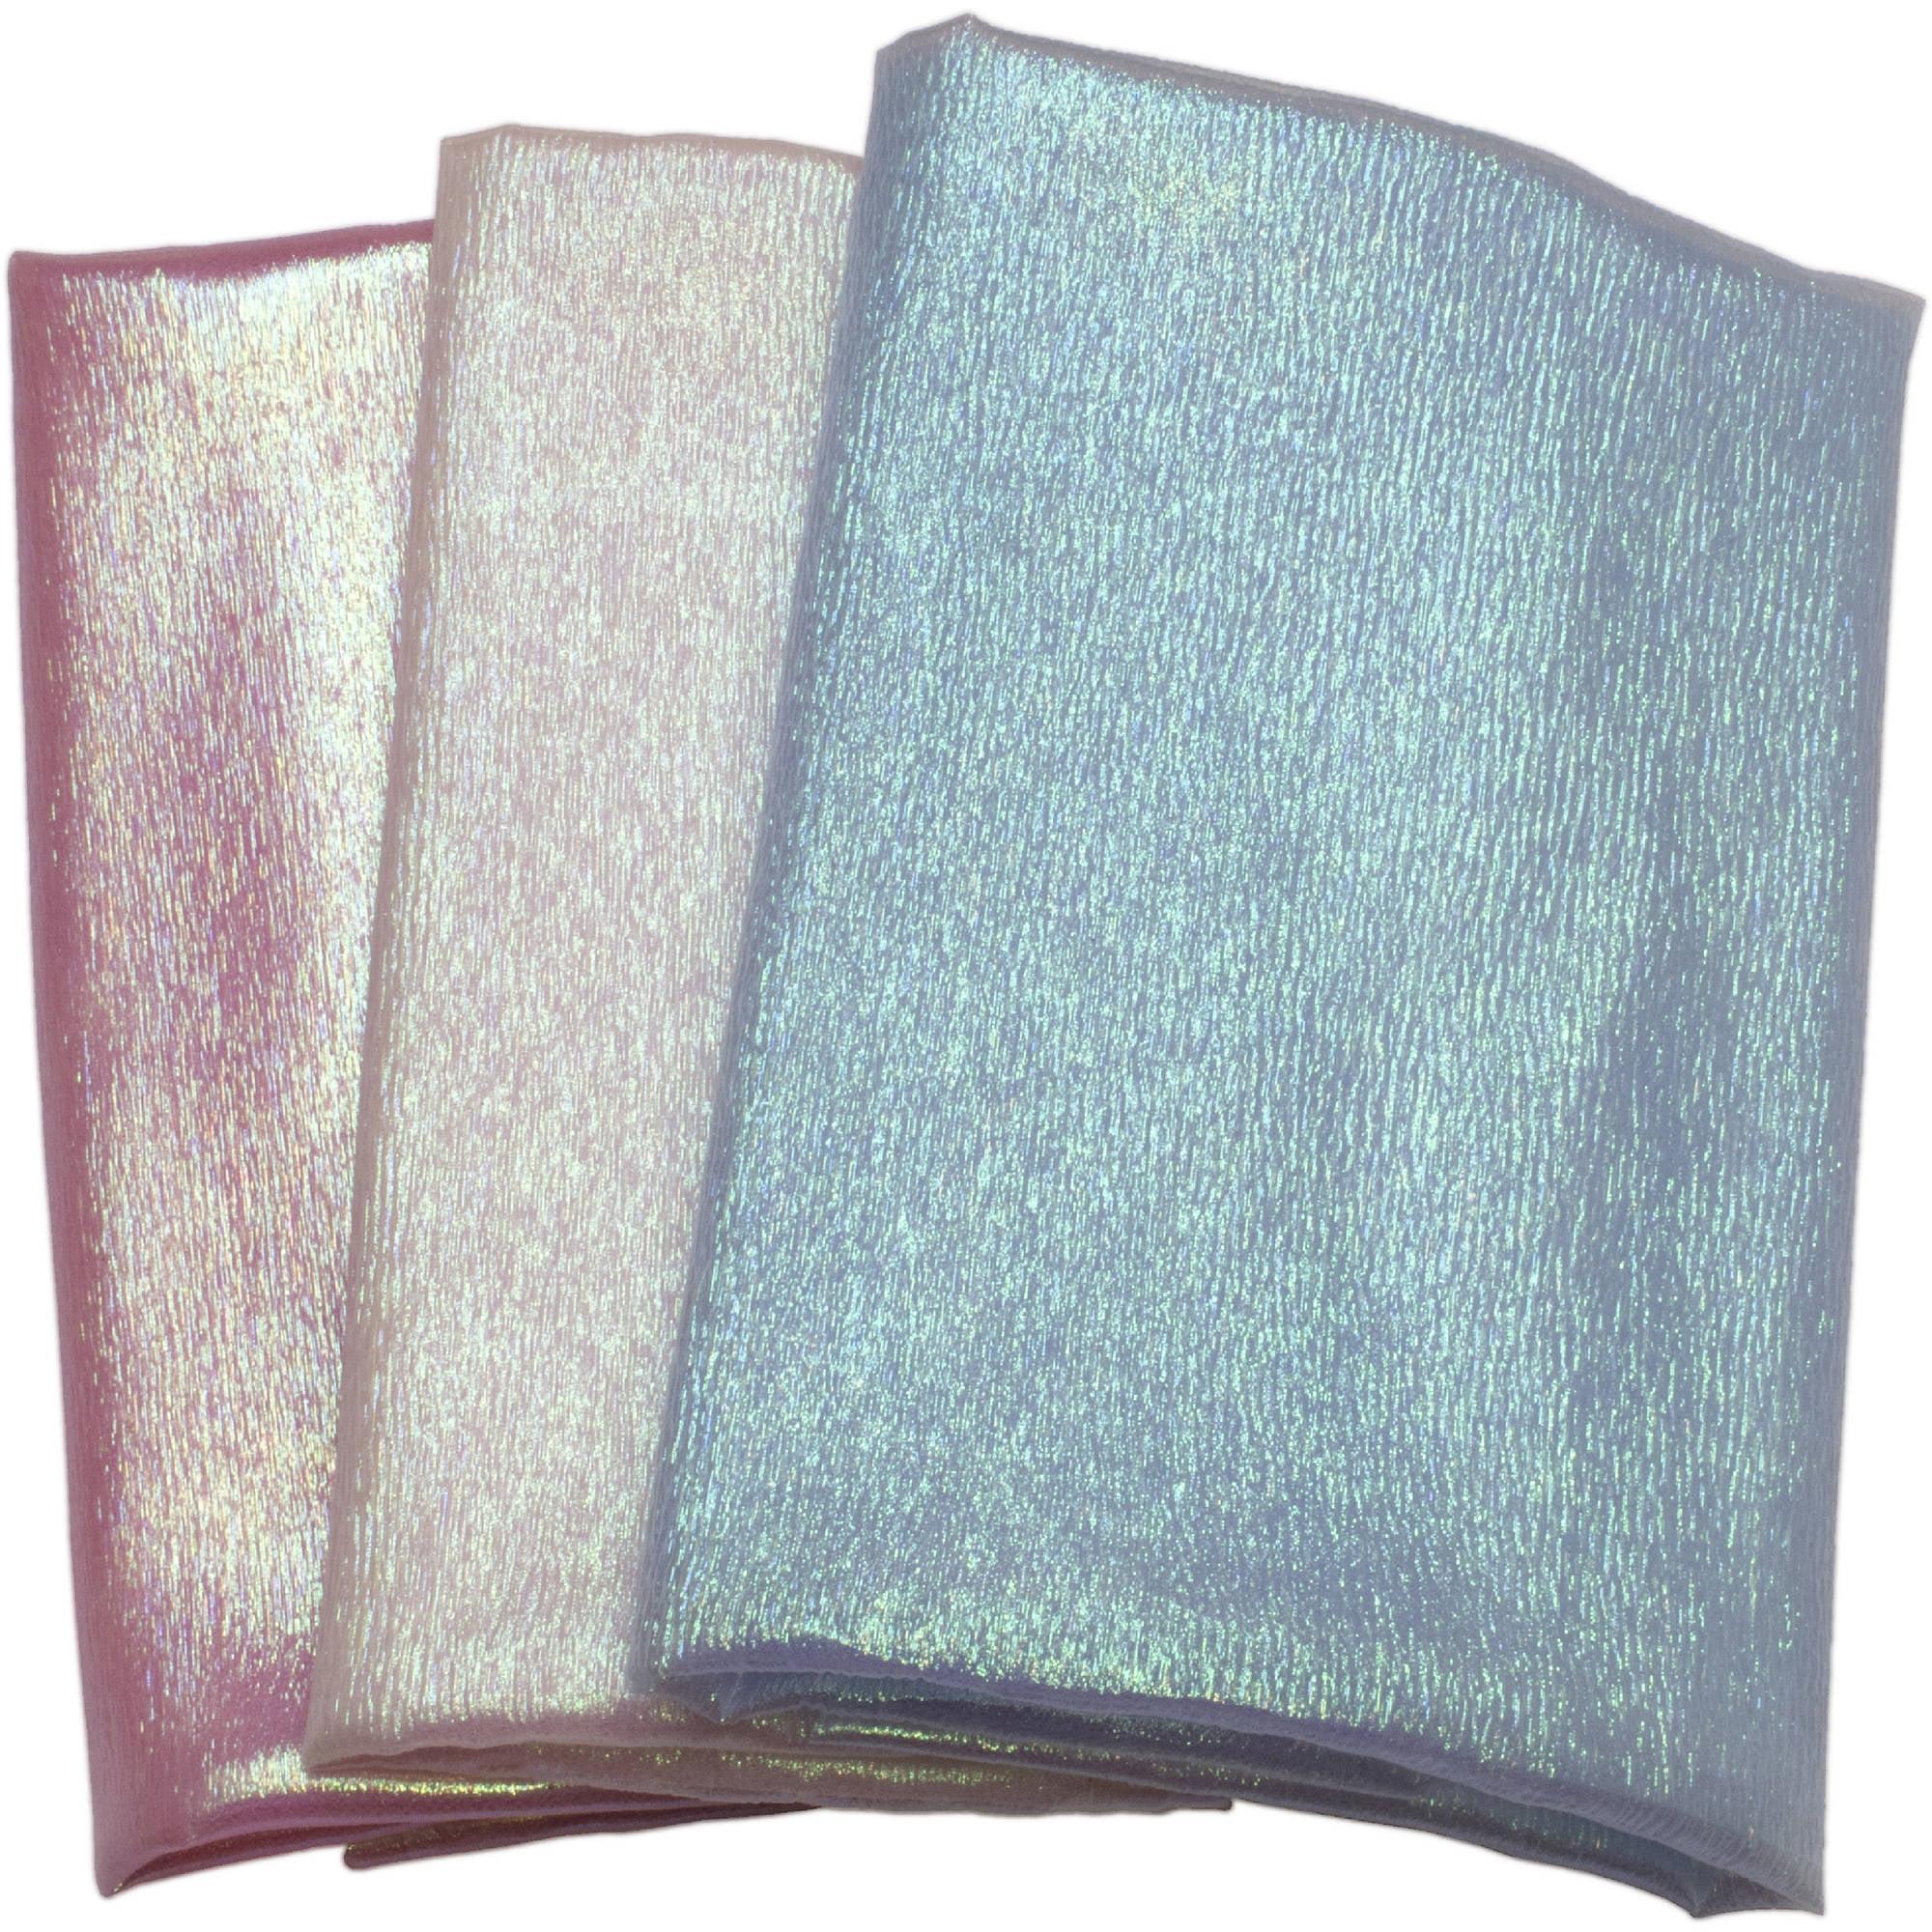 "David Textiles Iridescent Organza Fabric by the Yard, 44""W"